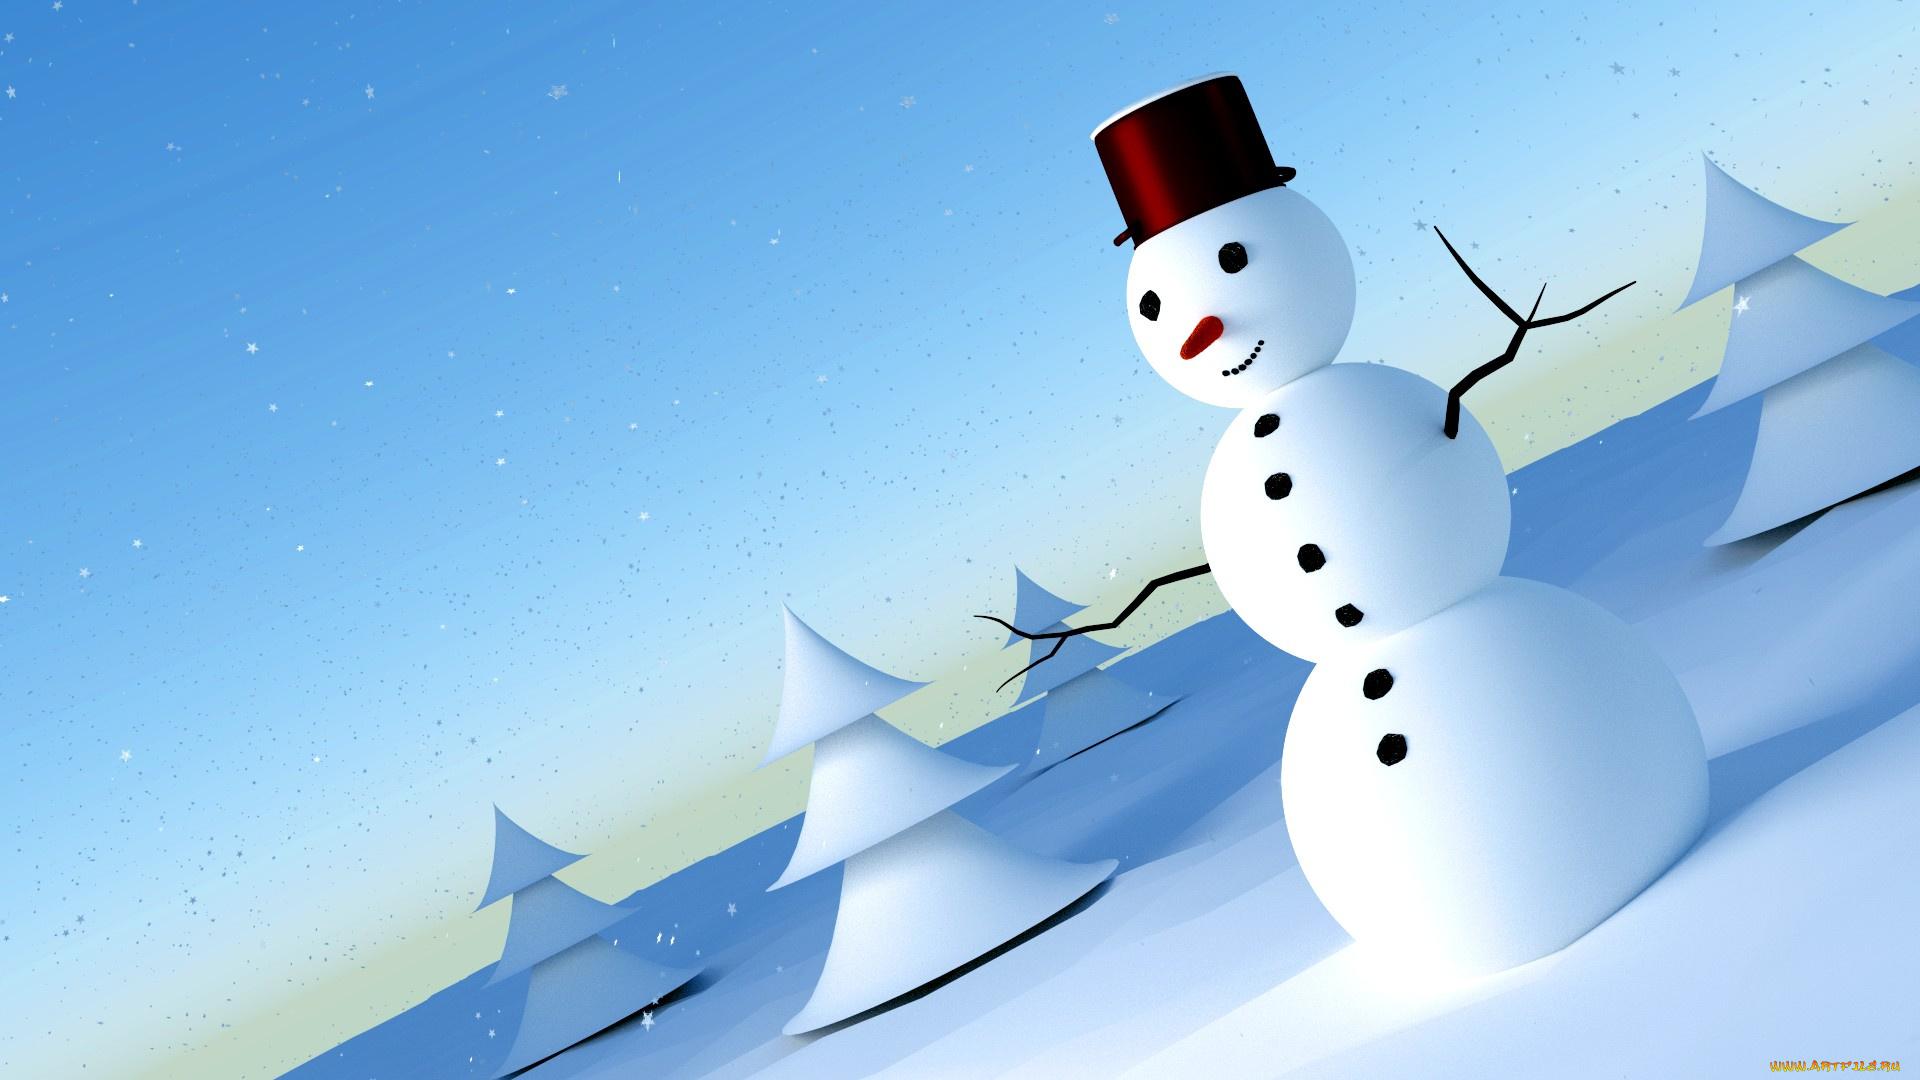 Сентября, новогодние картинки со снеговиками на рабочий стол